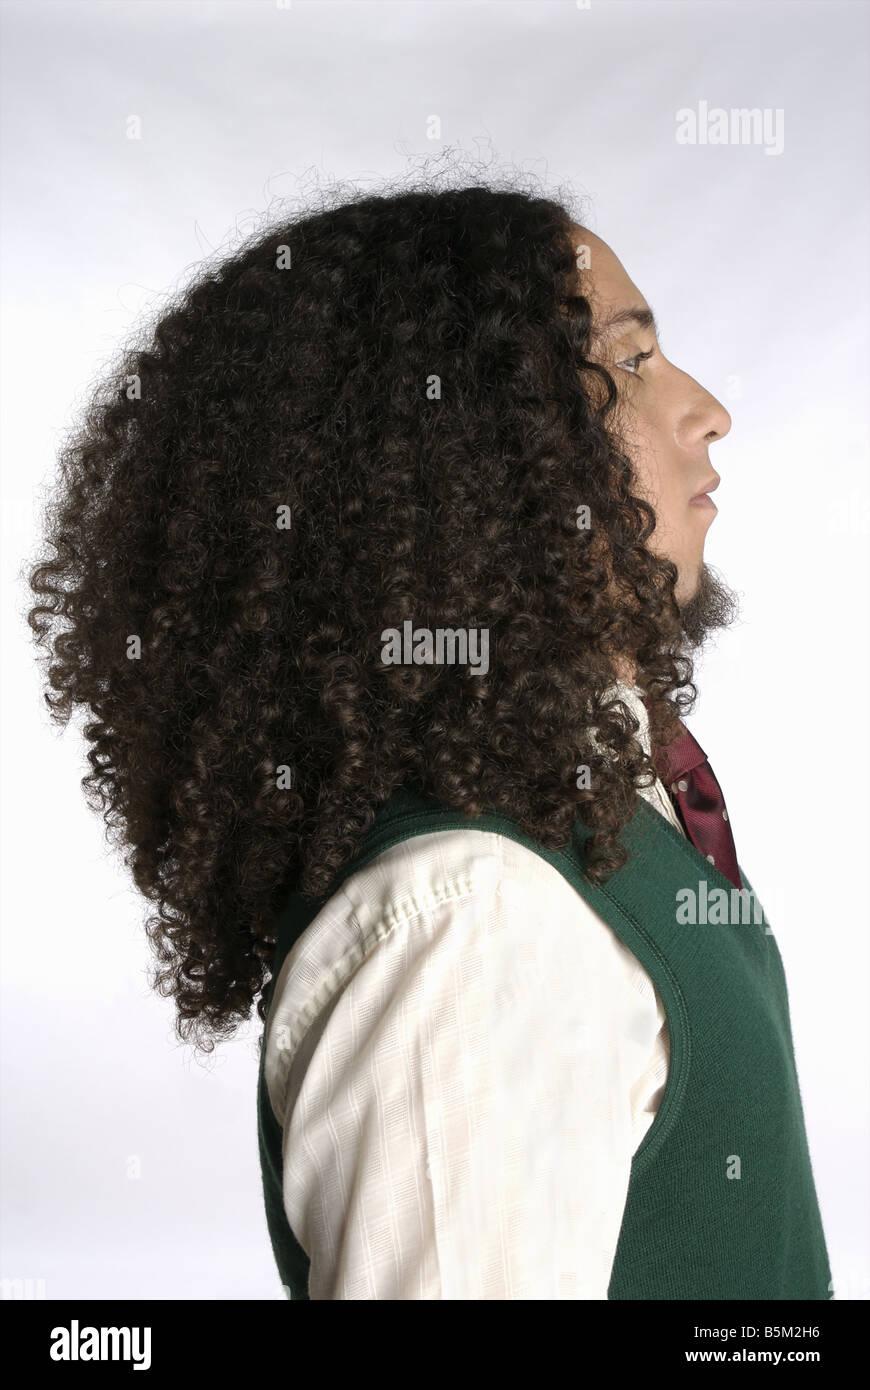 Shaggy pelirroja hombre en traje formal. Imagen De Stock